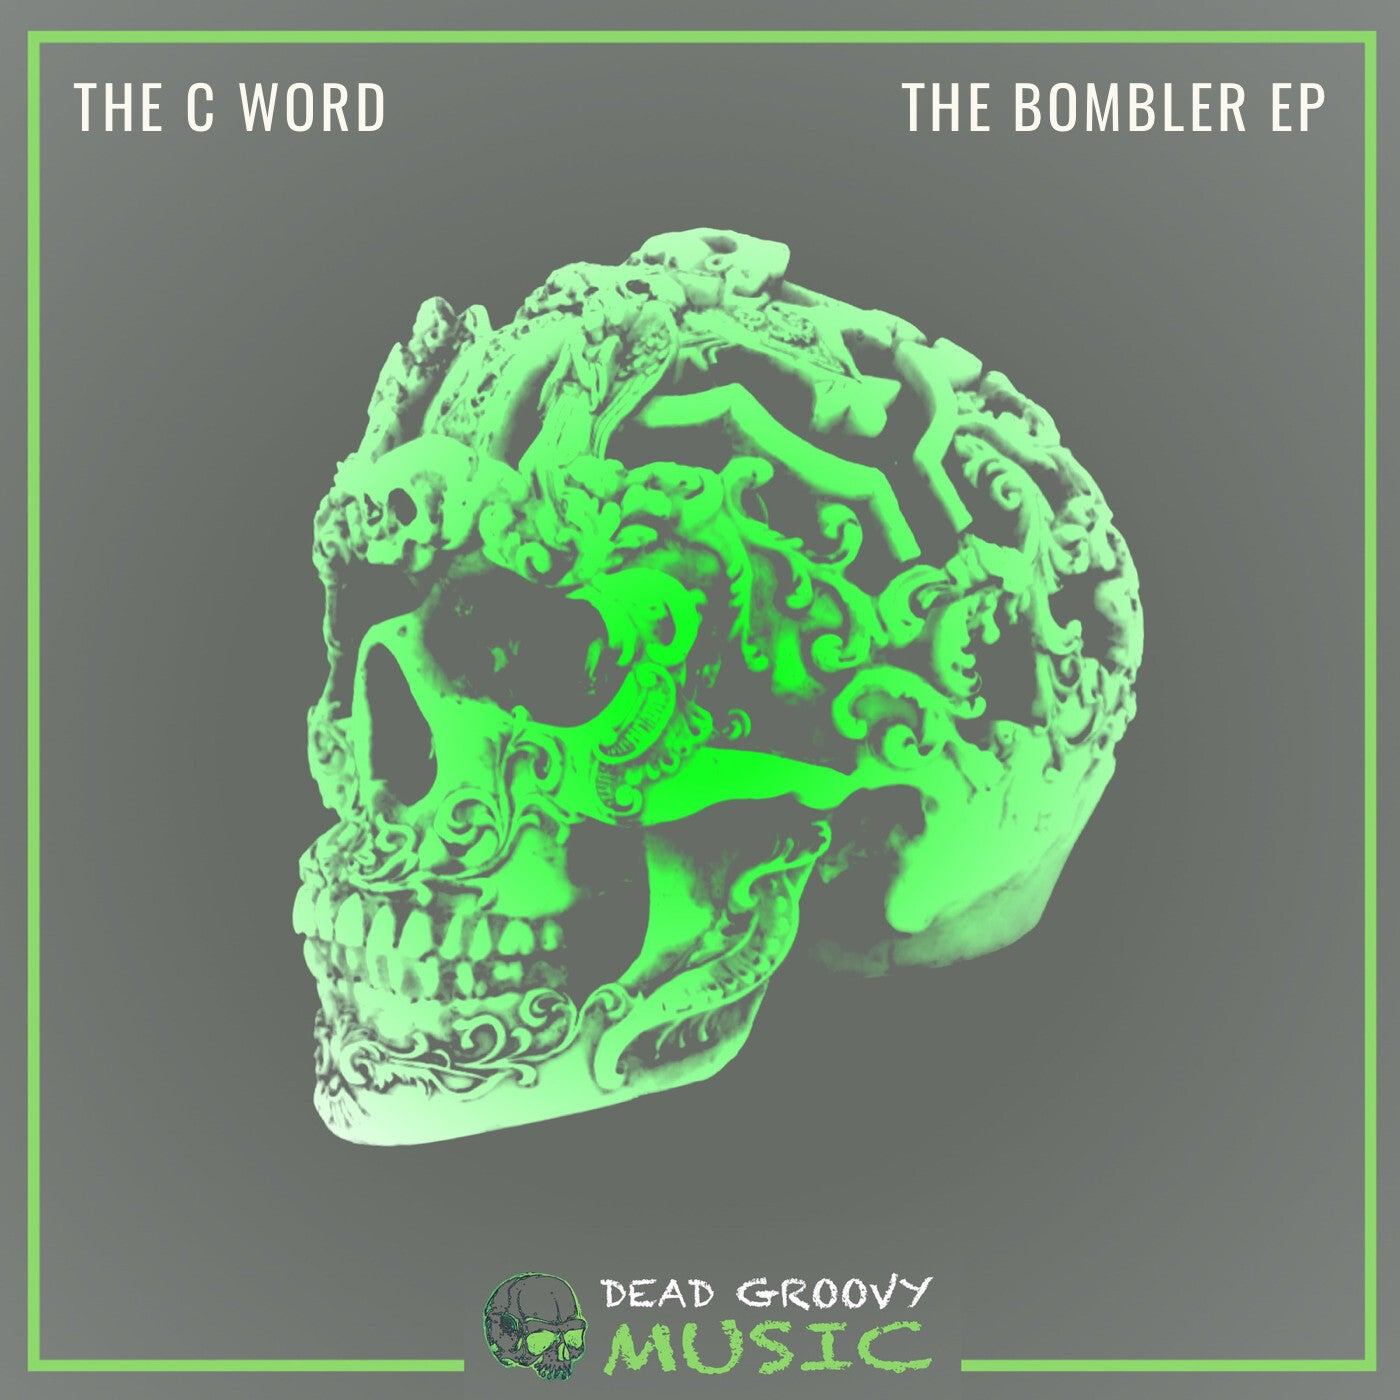 The Bombler